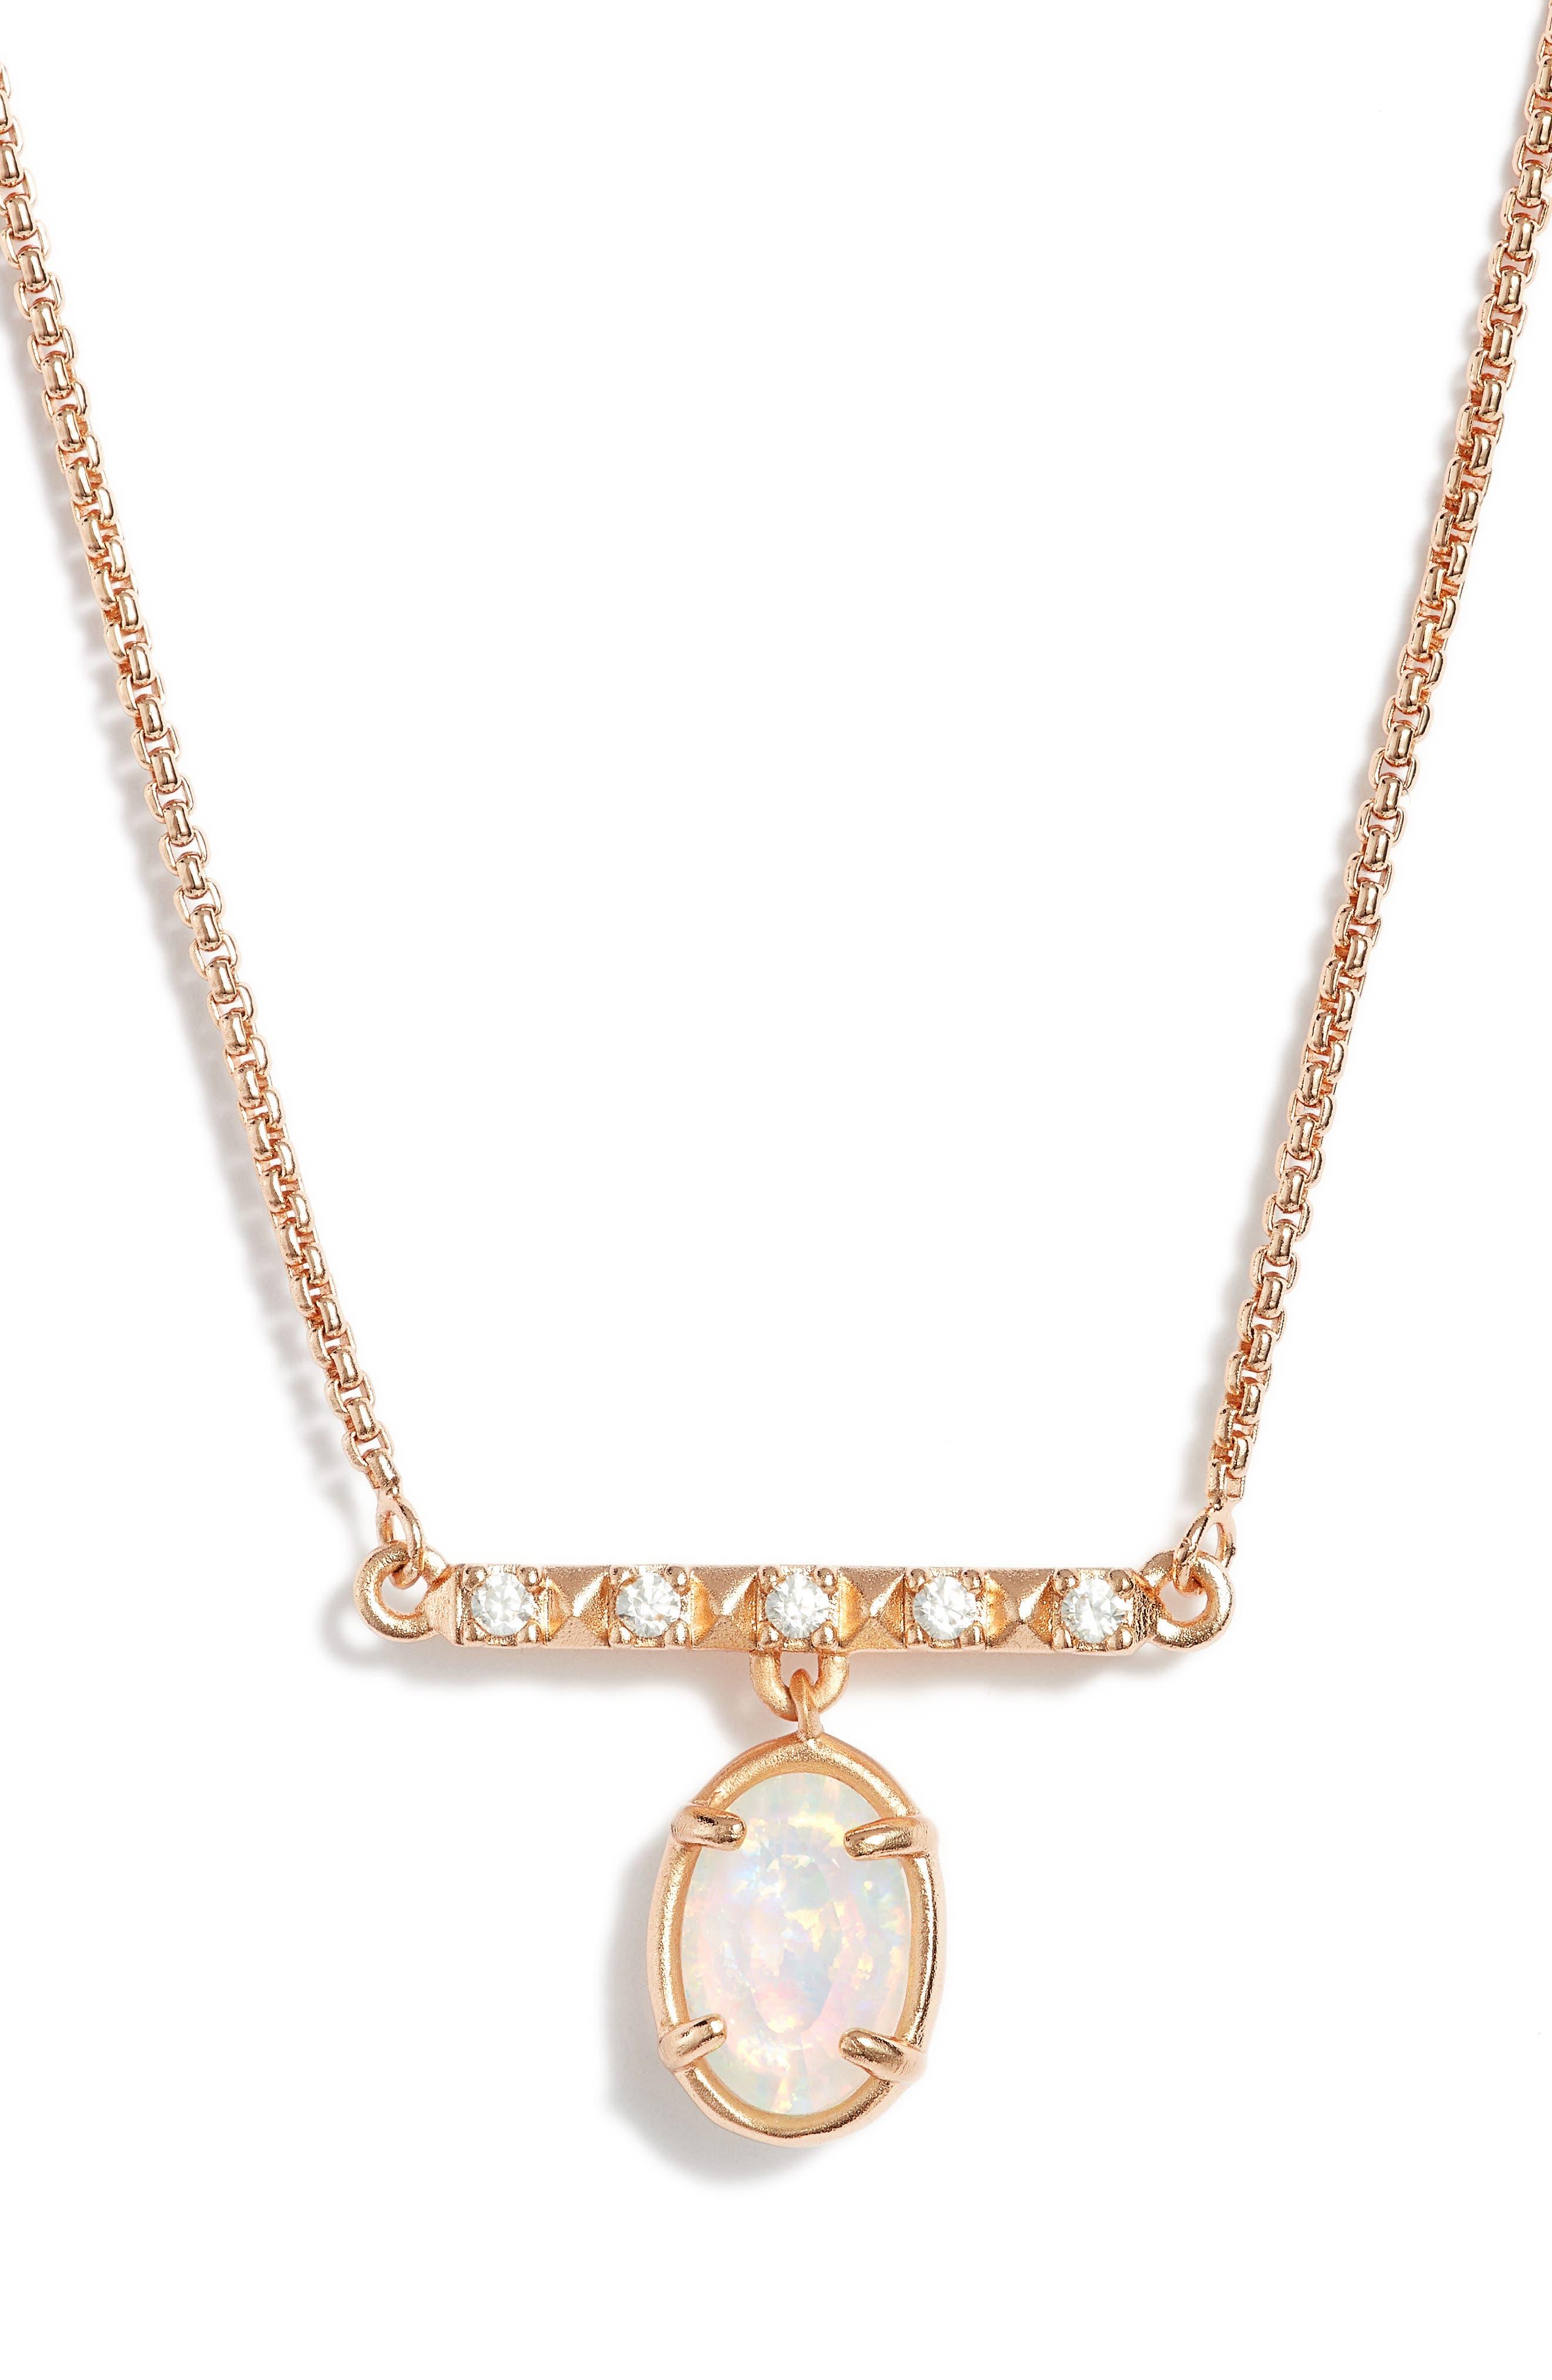 Fischer Opal Pendant Necklace,                         Main,                         color, White Opal/ Rose Gold